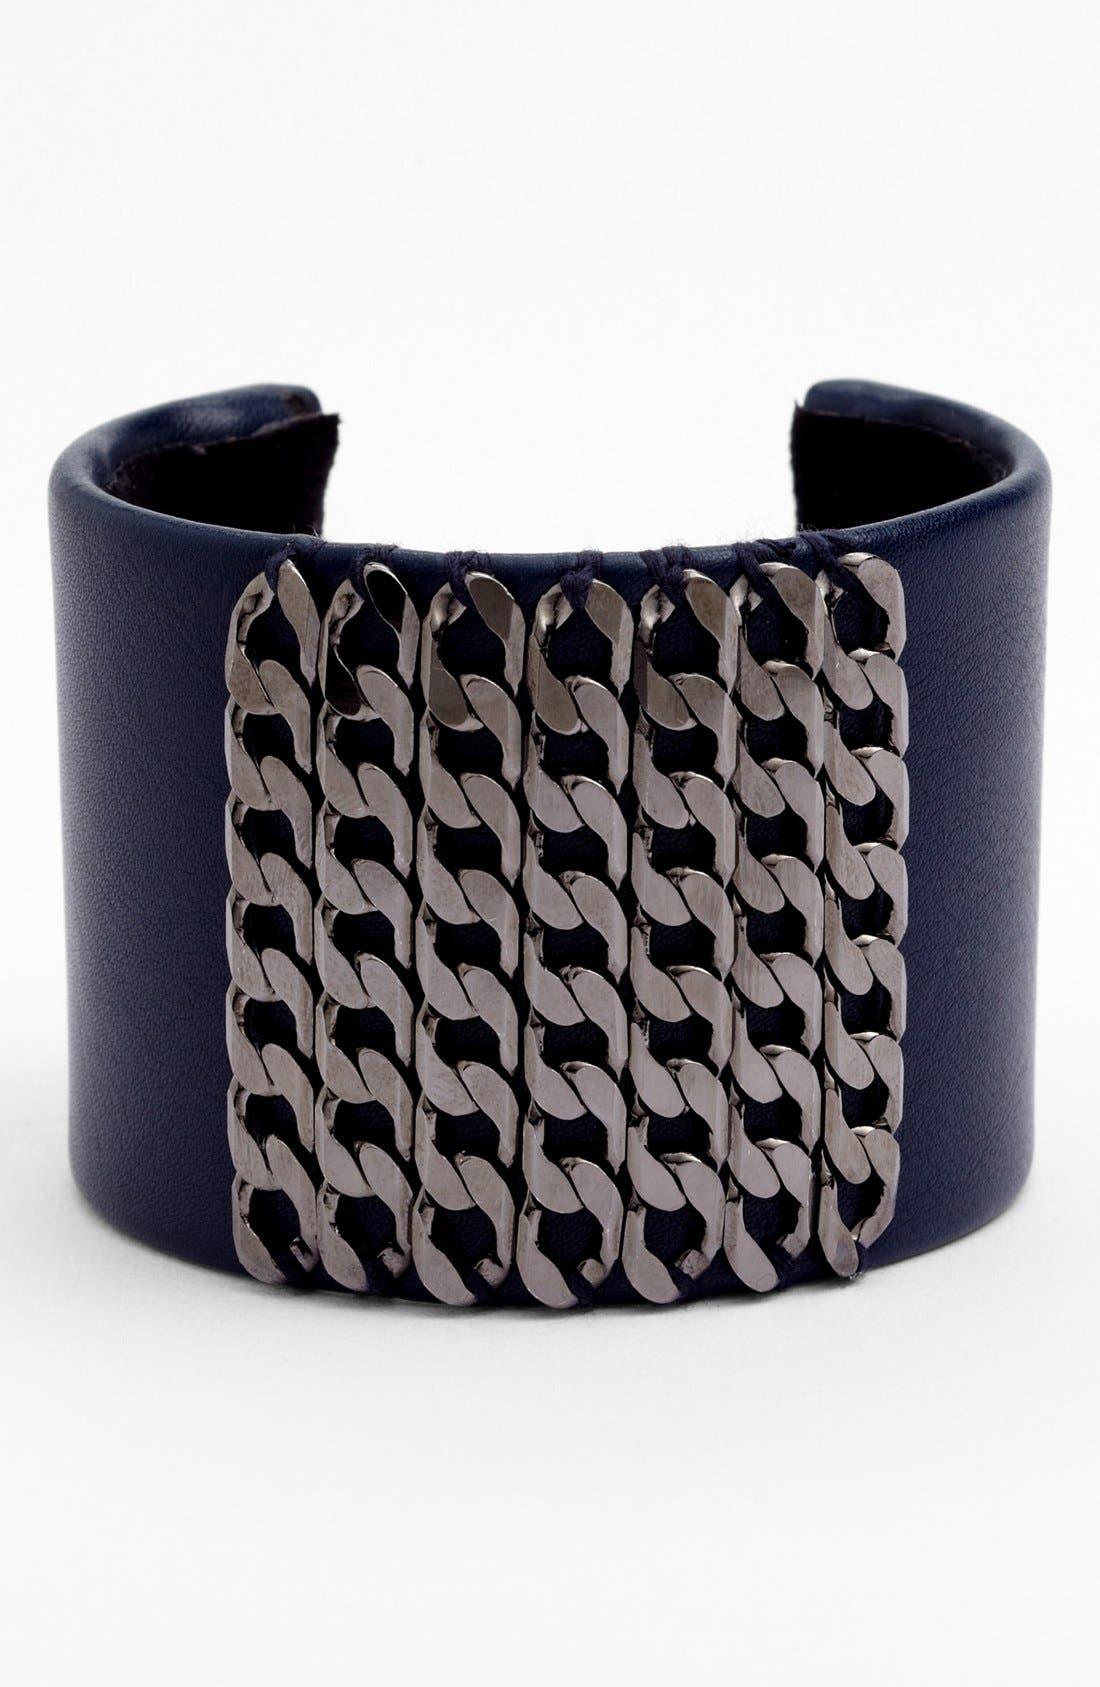 Alternate Image 1 Selected - Natasha Couture Chain Link Cuff